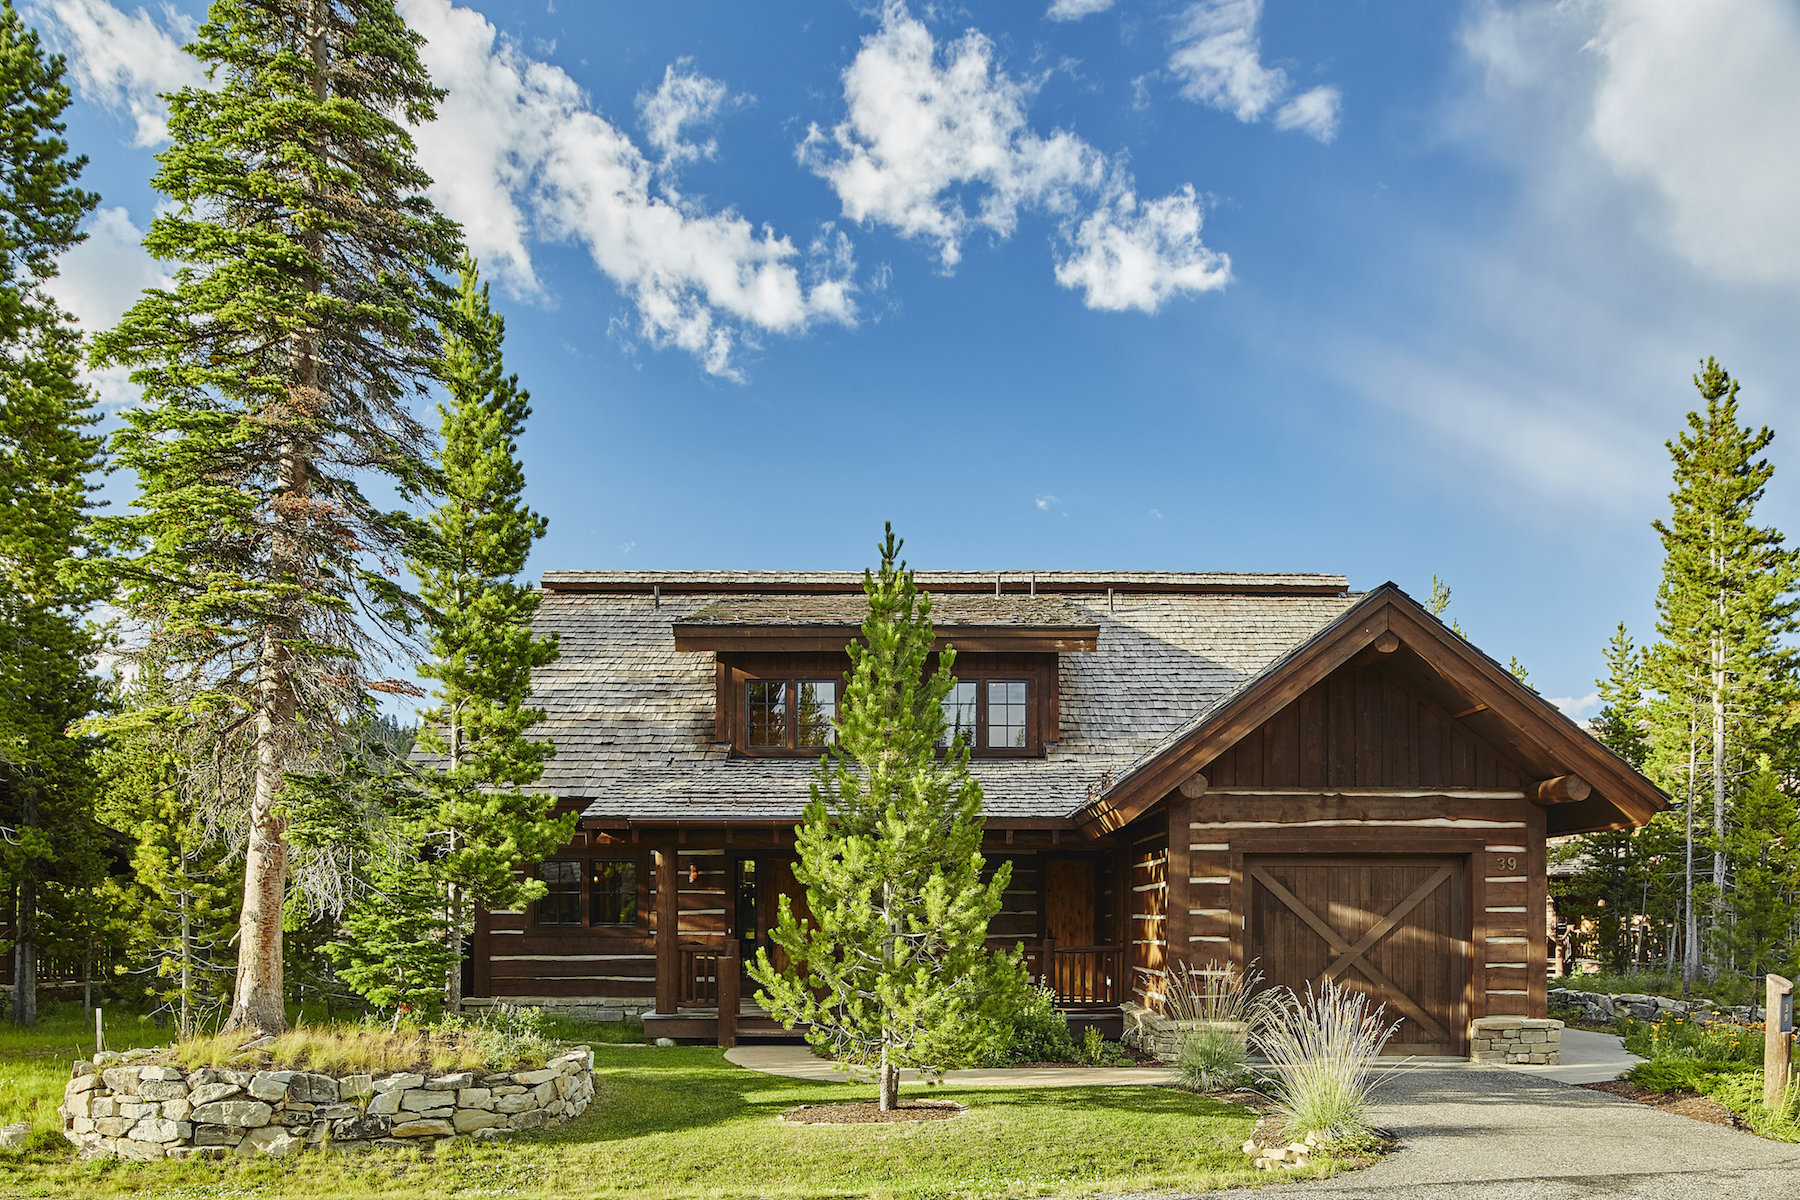 独户住宅 为 销售 在 Spanish Peaks Mountain Club Cabin 39 Homestead Cabin Fork Big Sky, 蒙大拿州 59716 美国